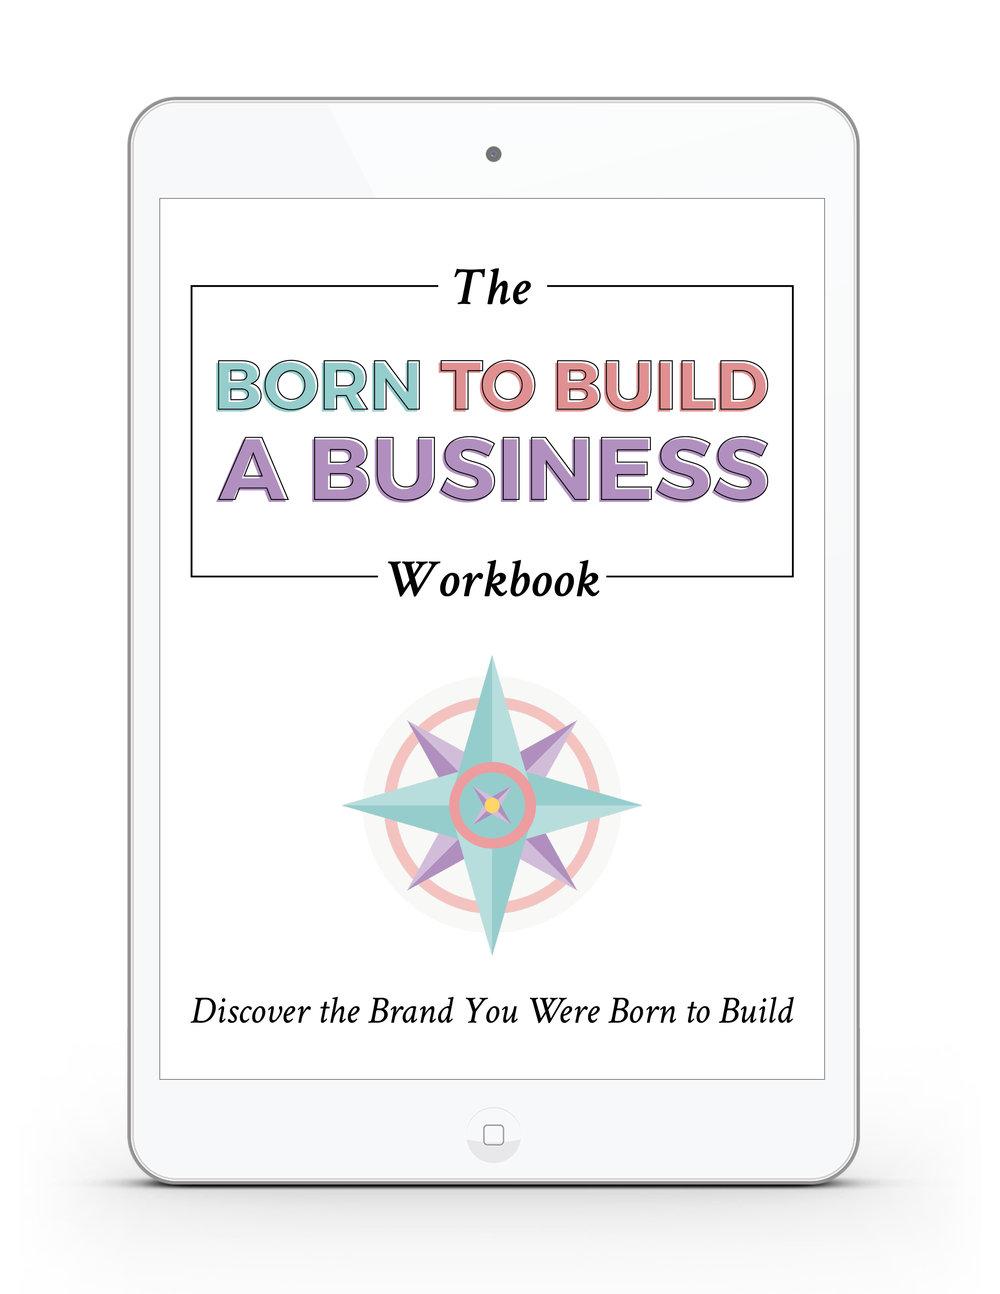 mockup-business-workbook-1.jpg